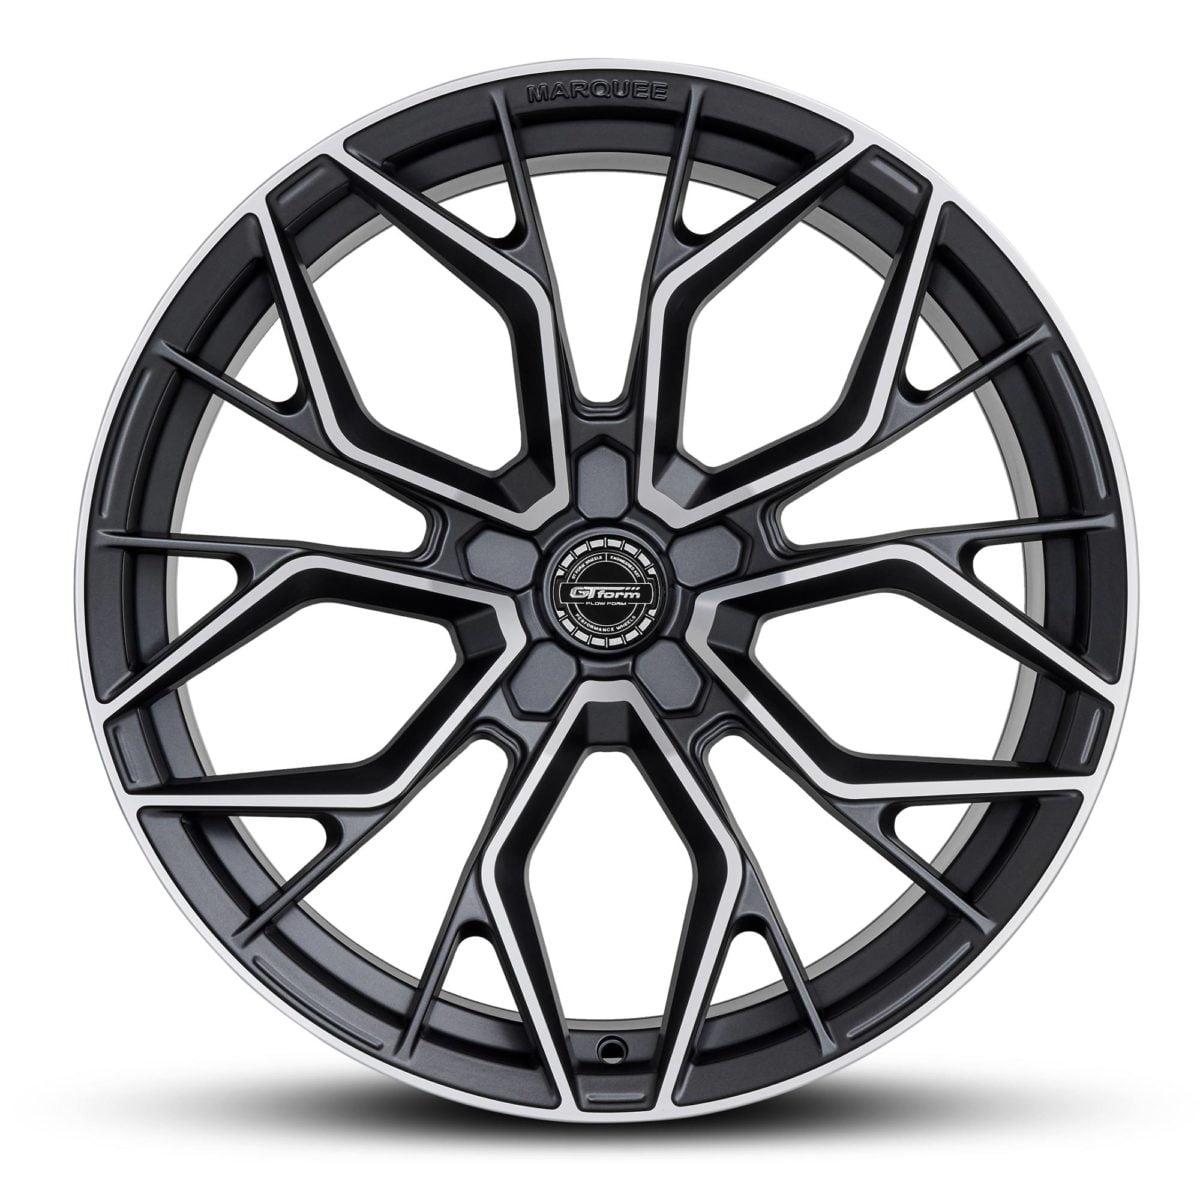 GT Form Marquee Satin Gunmetal Machined Face 20 inch Wheels Car Rims